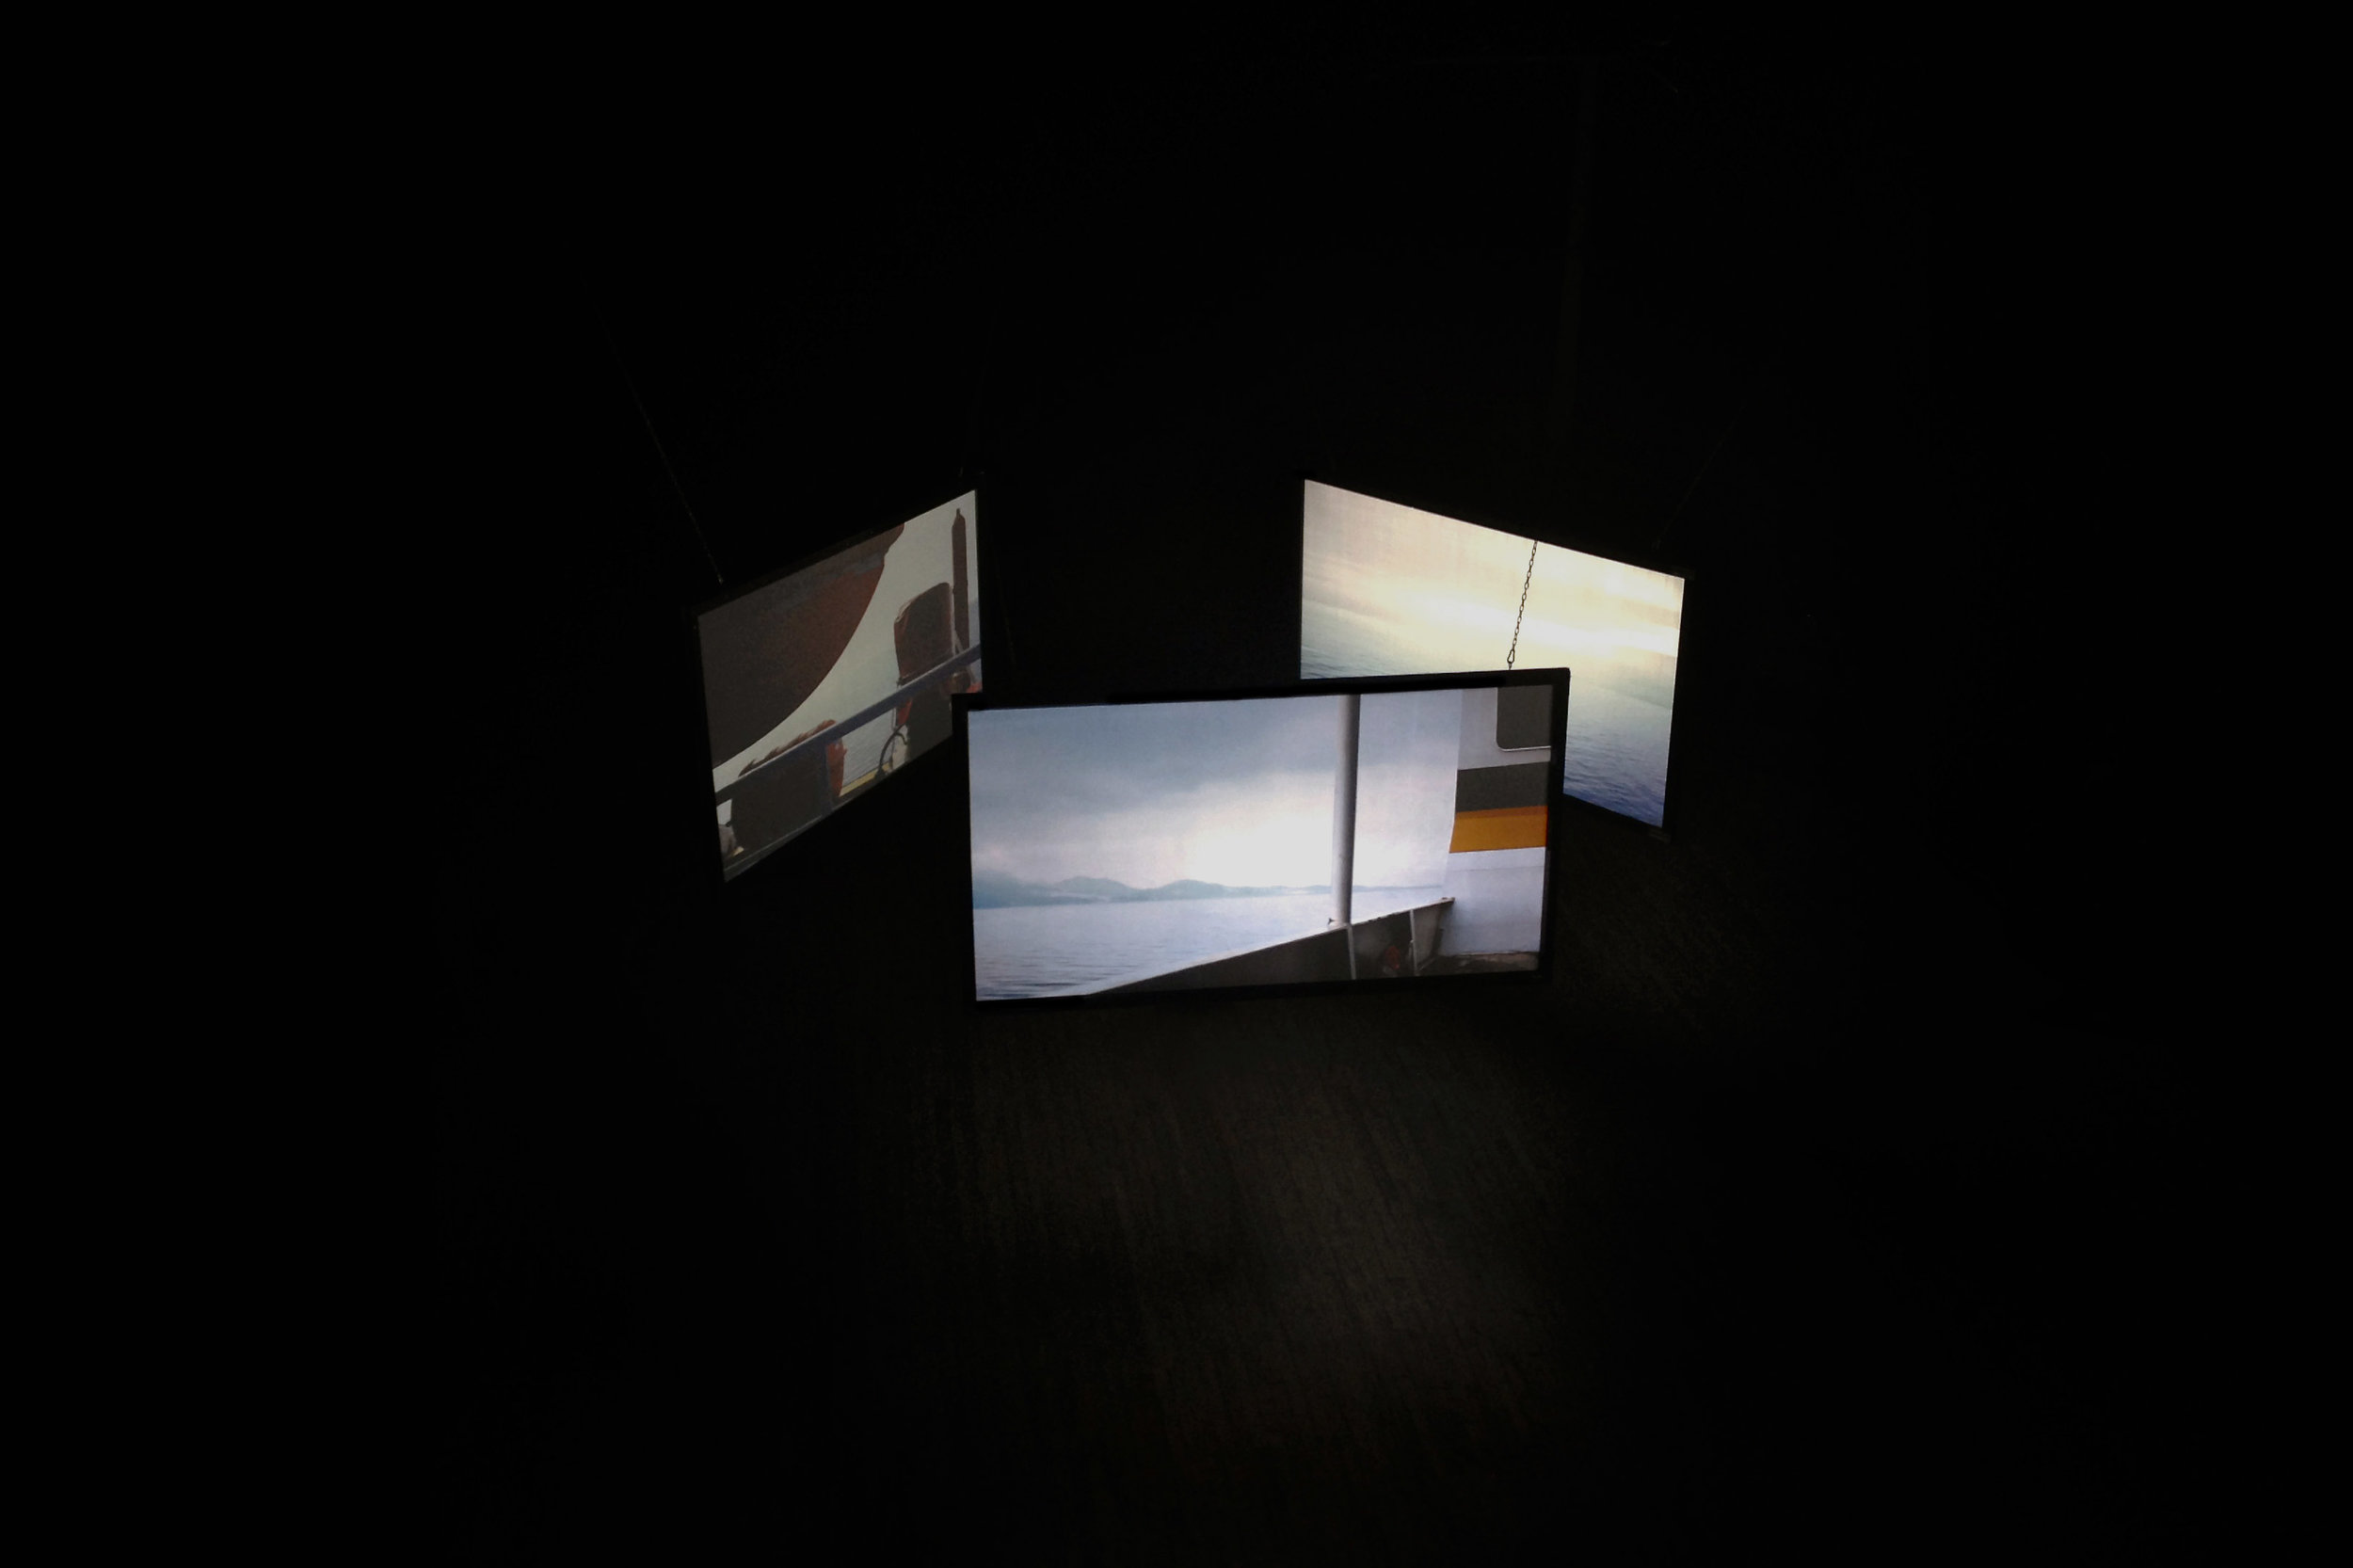 Installation-Mezzanine-View-01.jpg